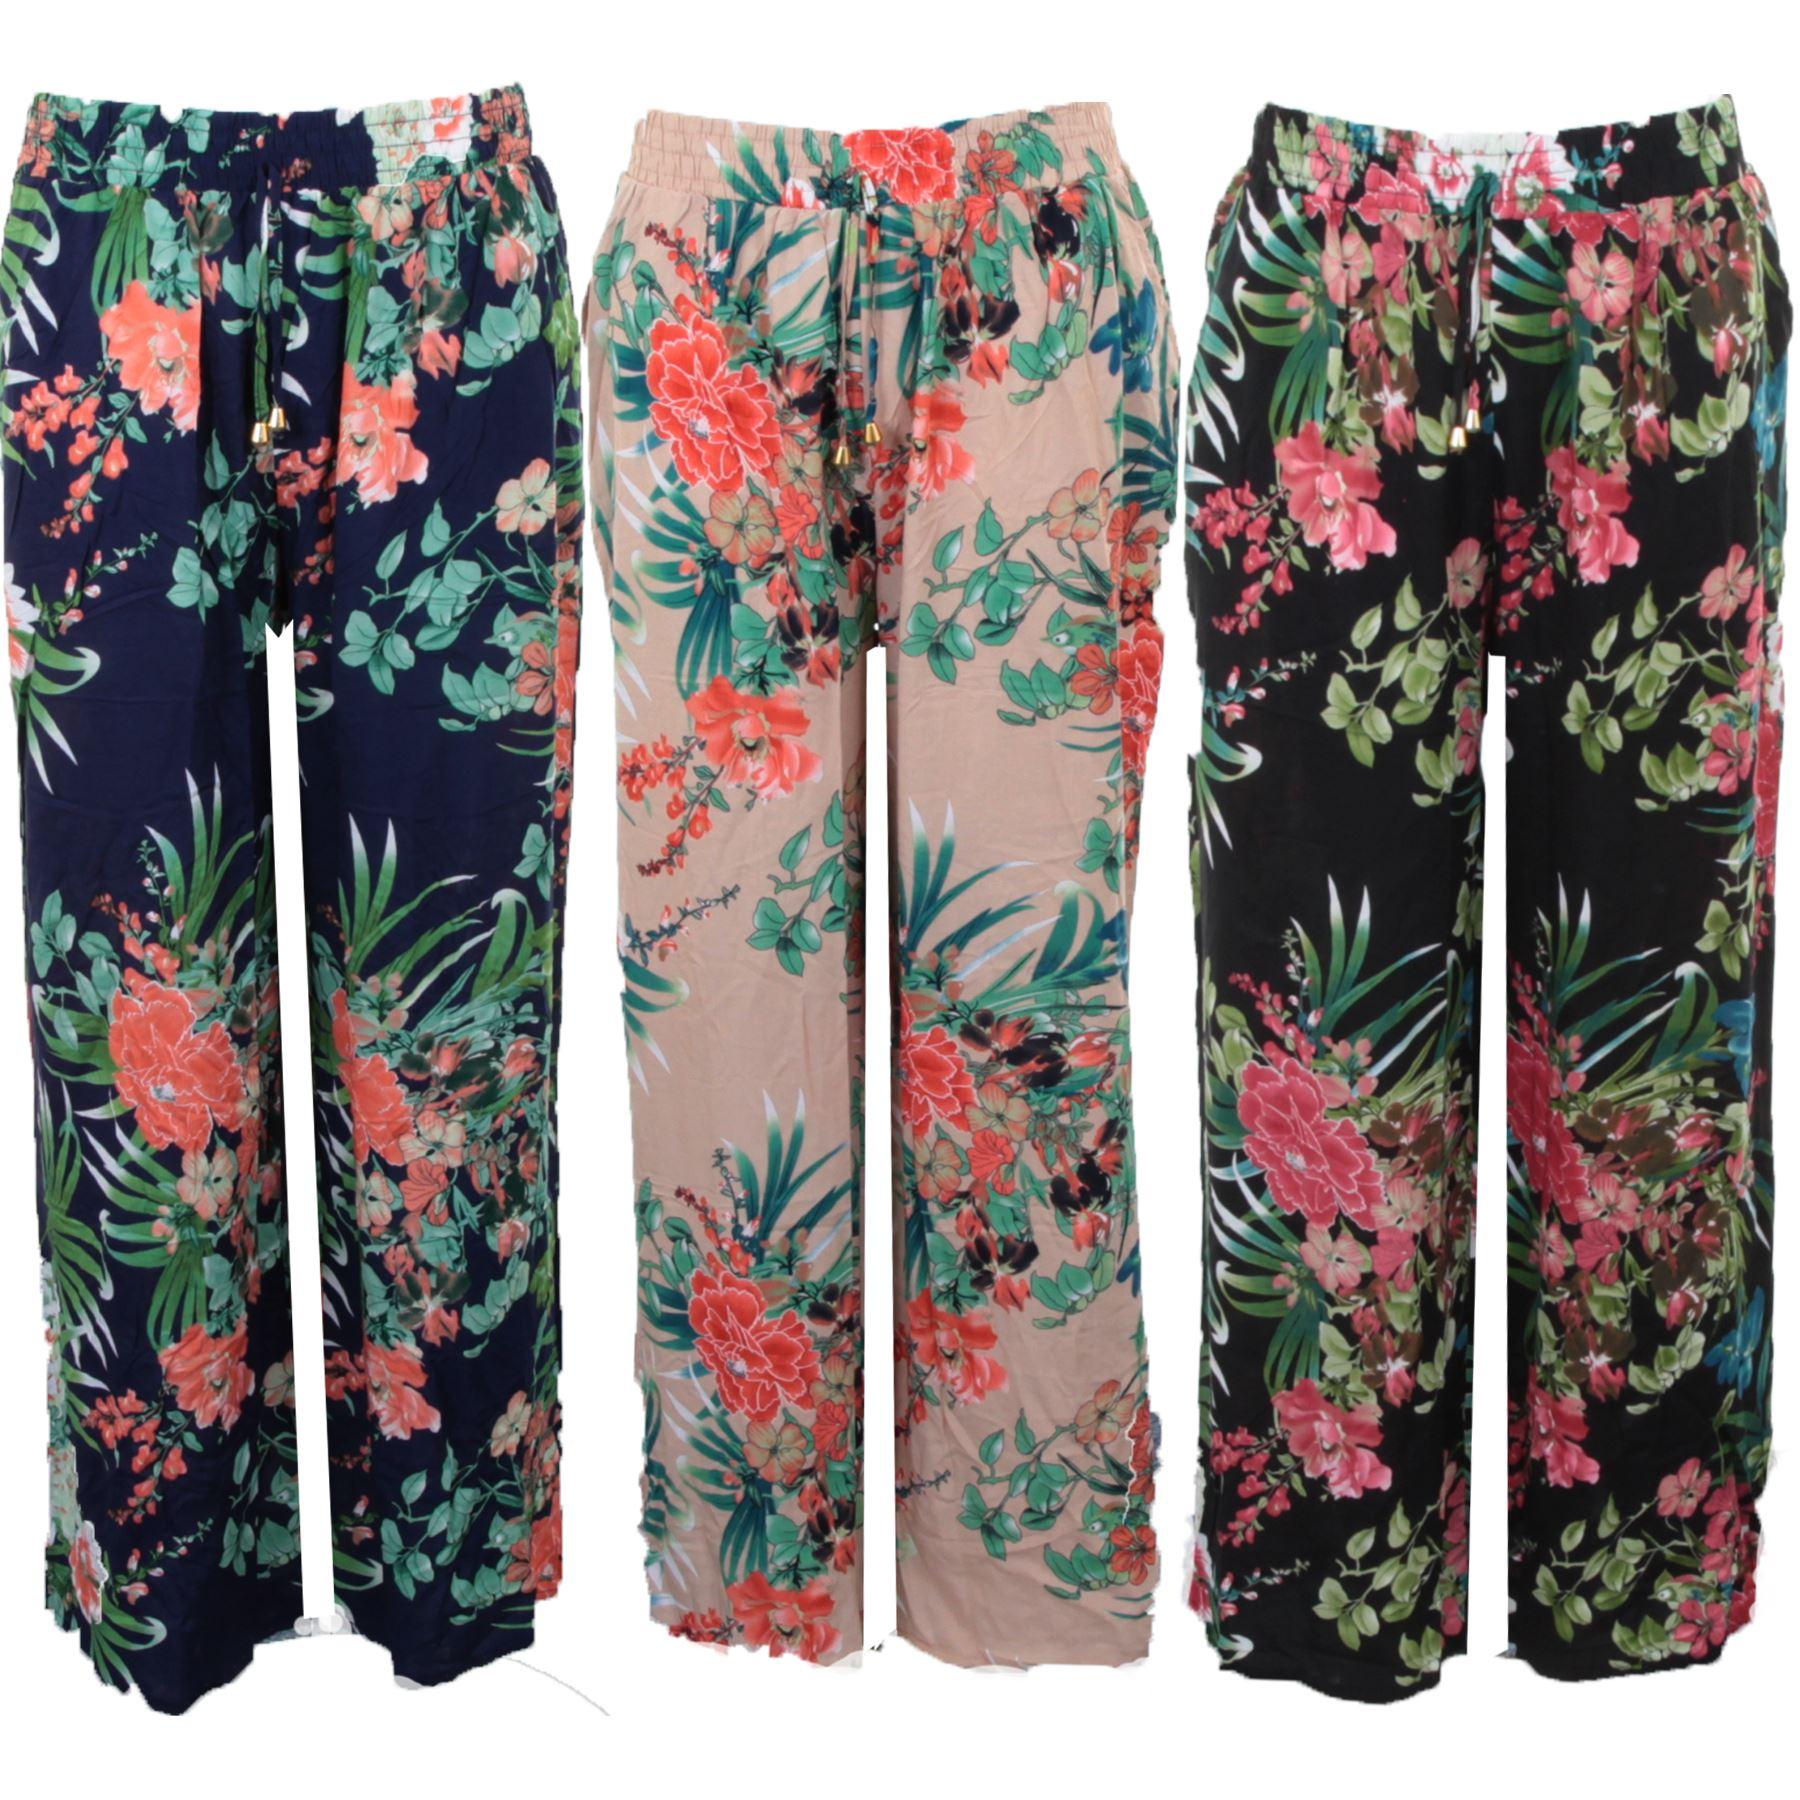 Details about Womens Plus Size Flare Wide Leg Elastic Waist Floral Print  Loose Pants Trousers